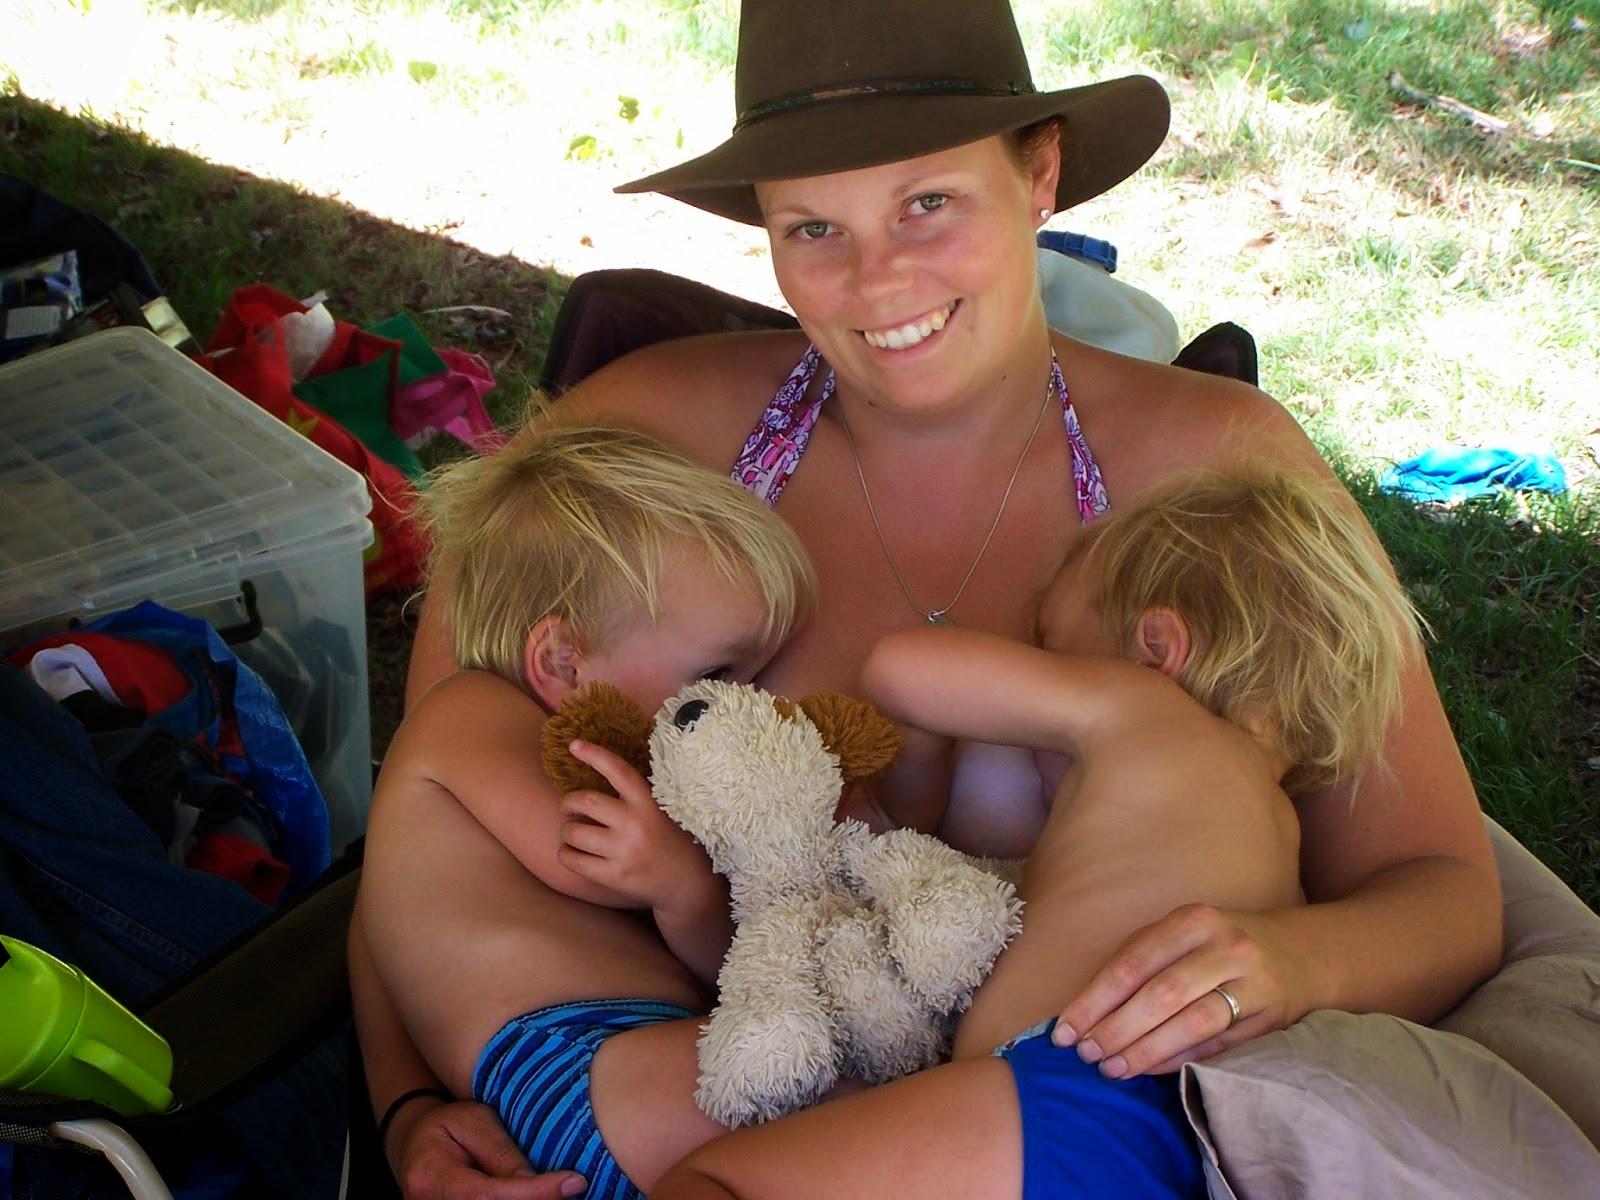 Breastfeeding the older baby. Weaning. Breastfeeding Twins